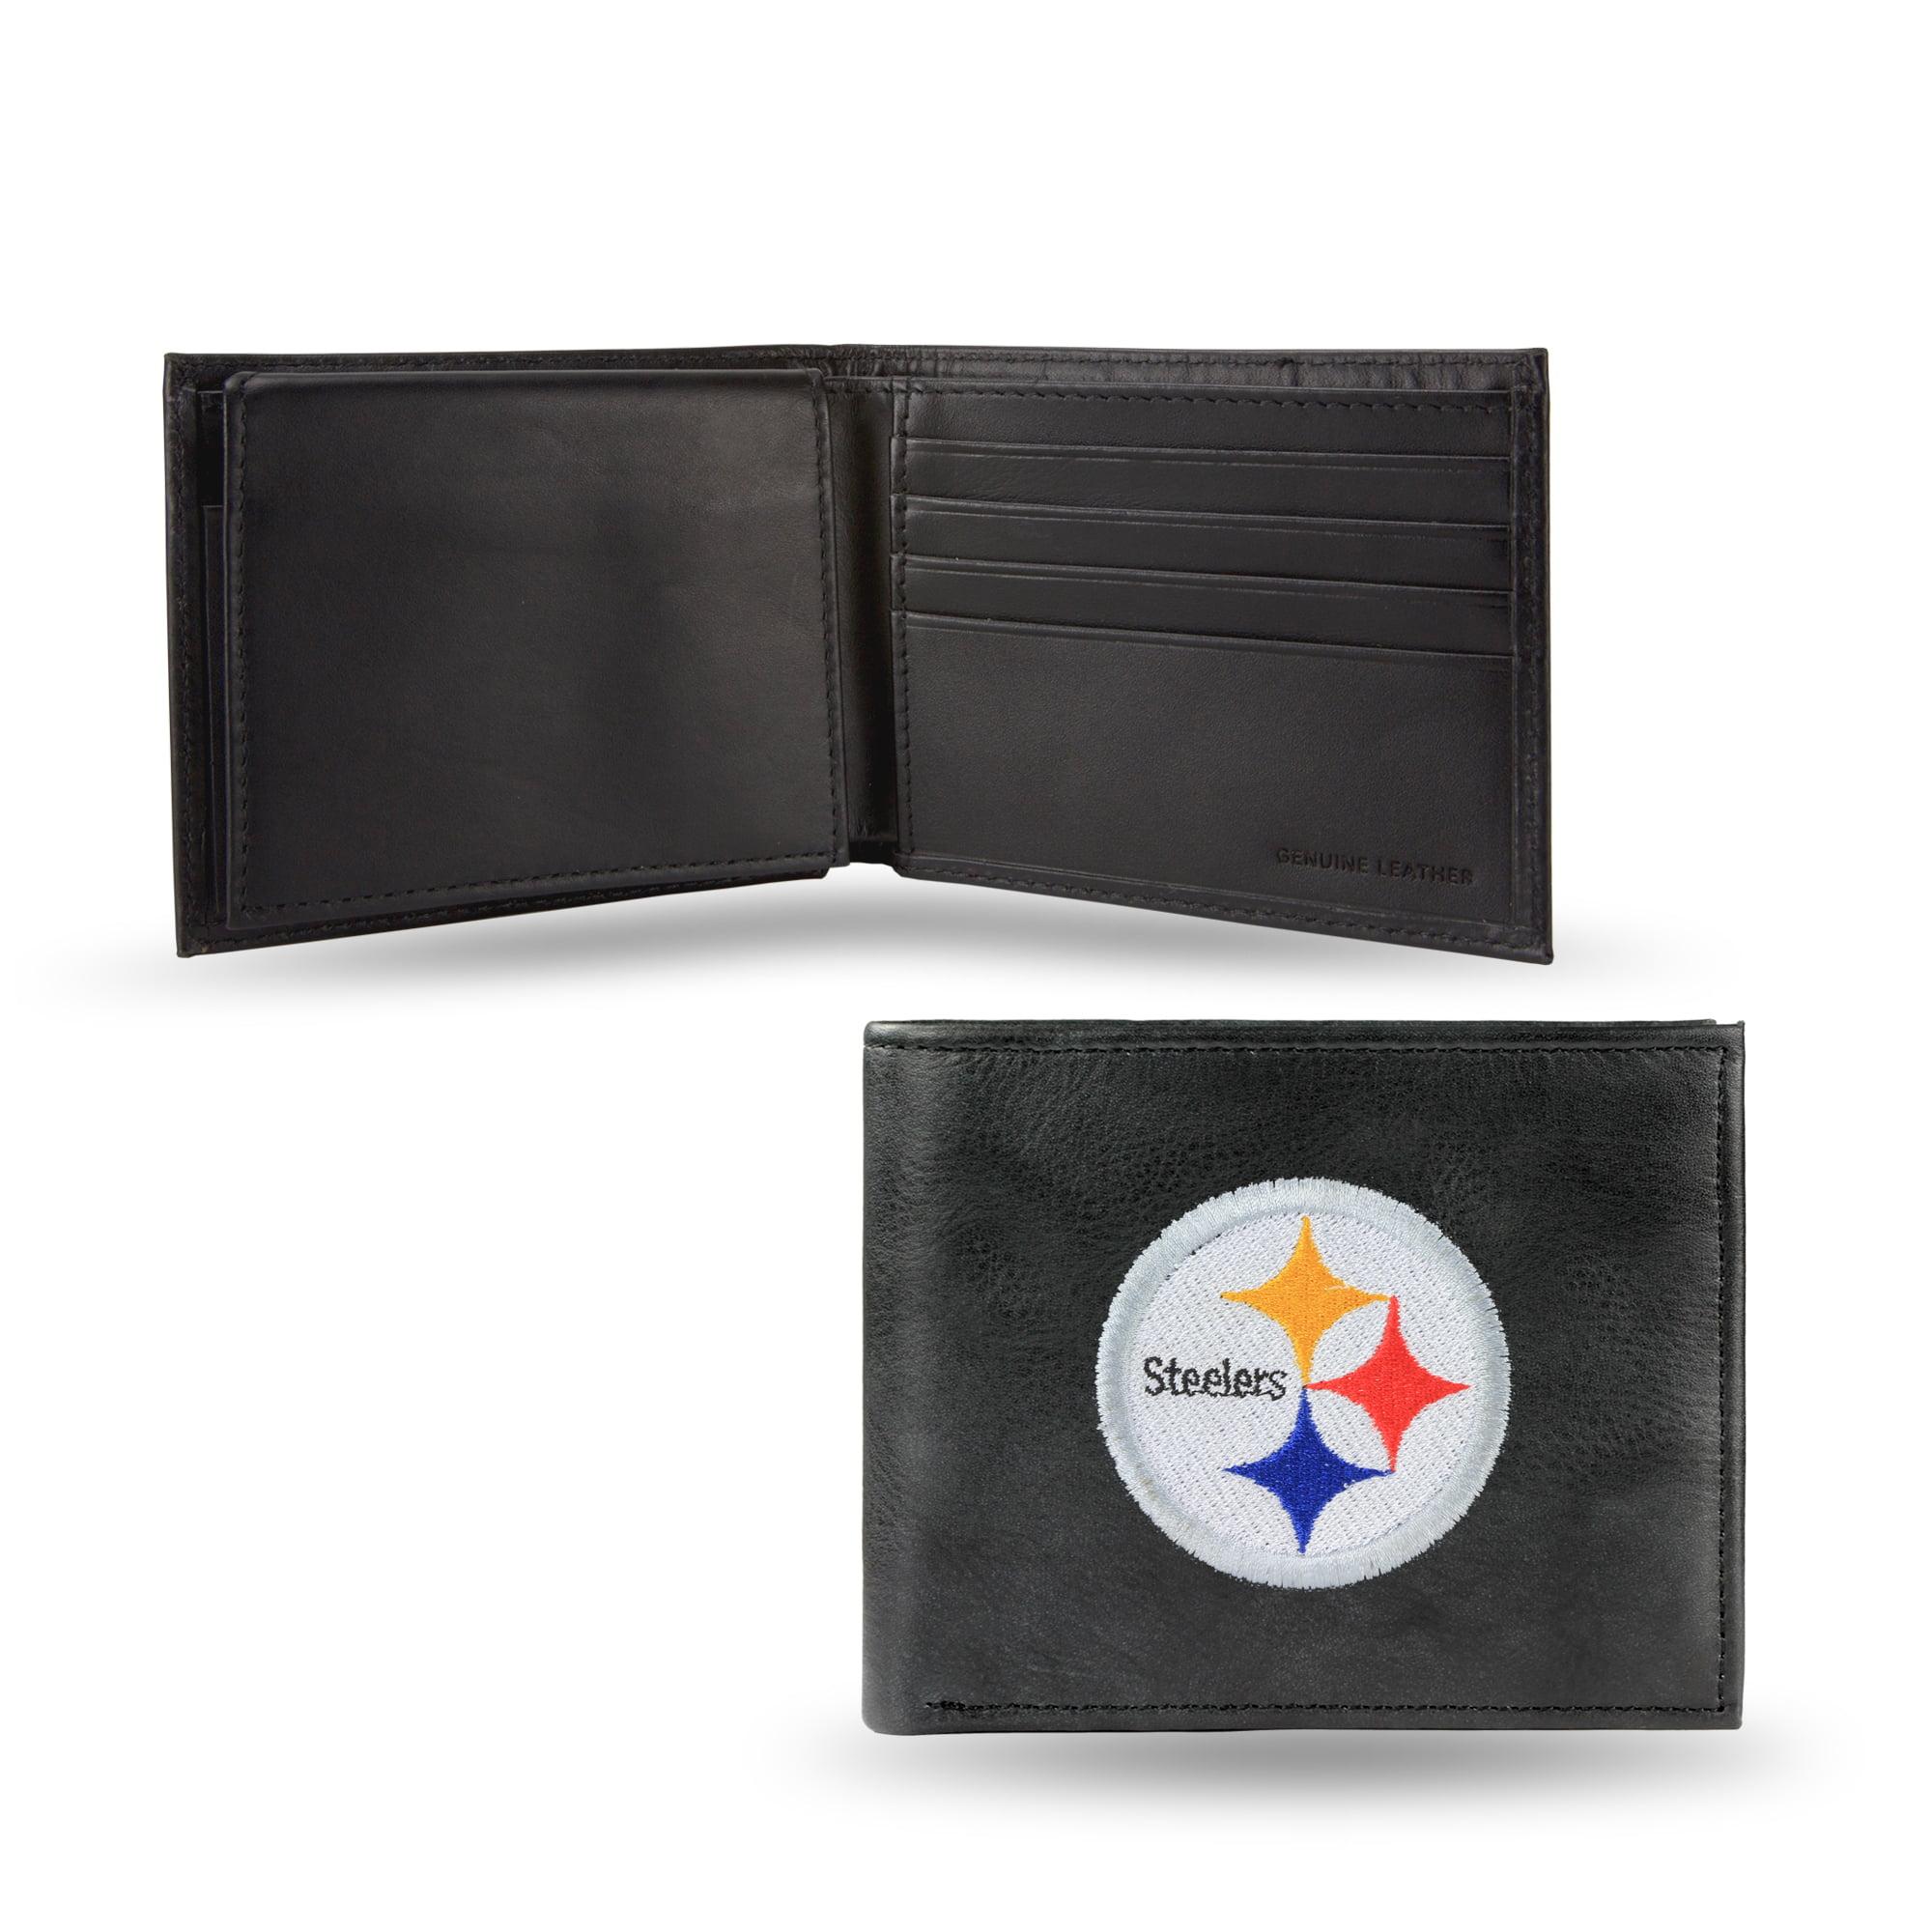 NFL - Men's Pittsburgh Steelers Embroidered Billfold Wallet